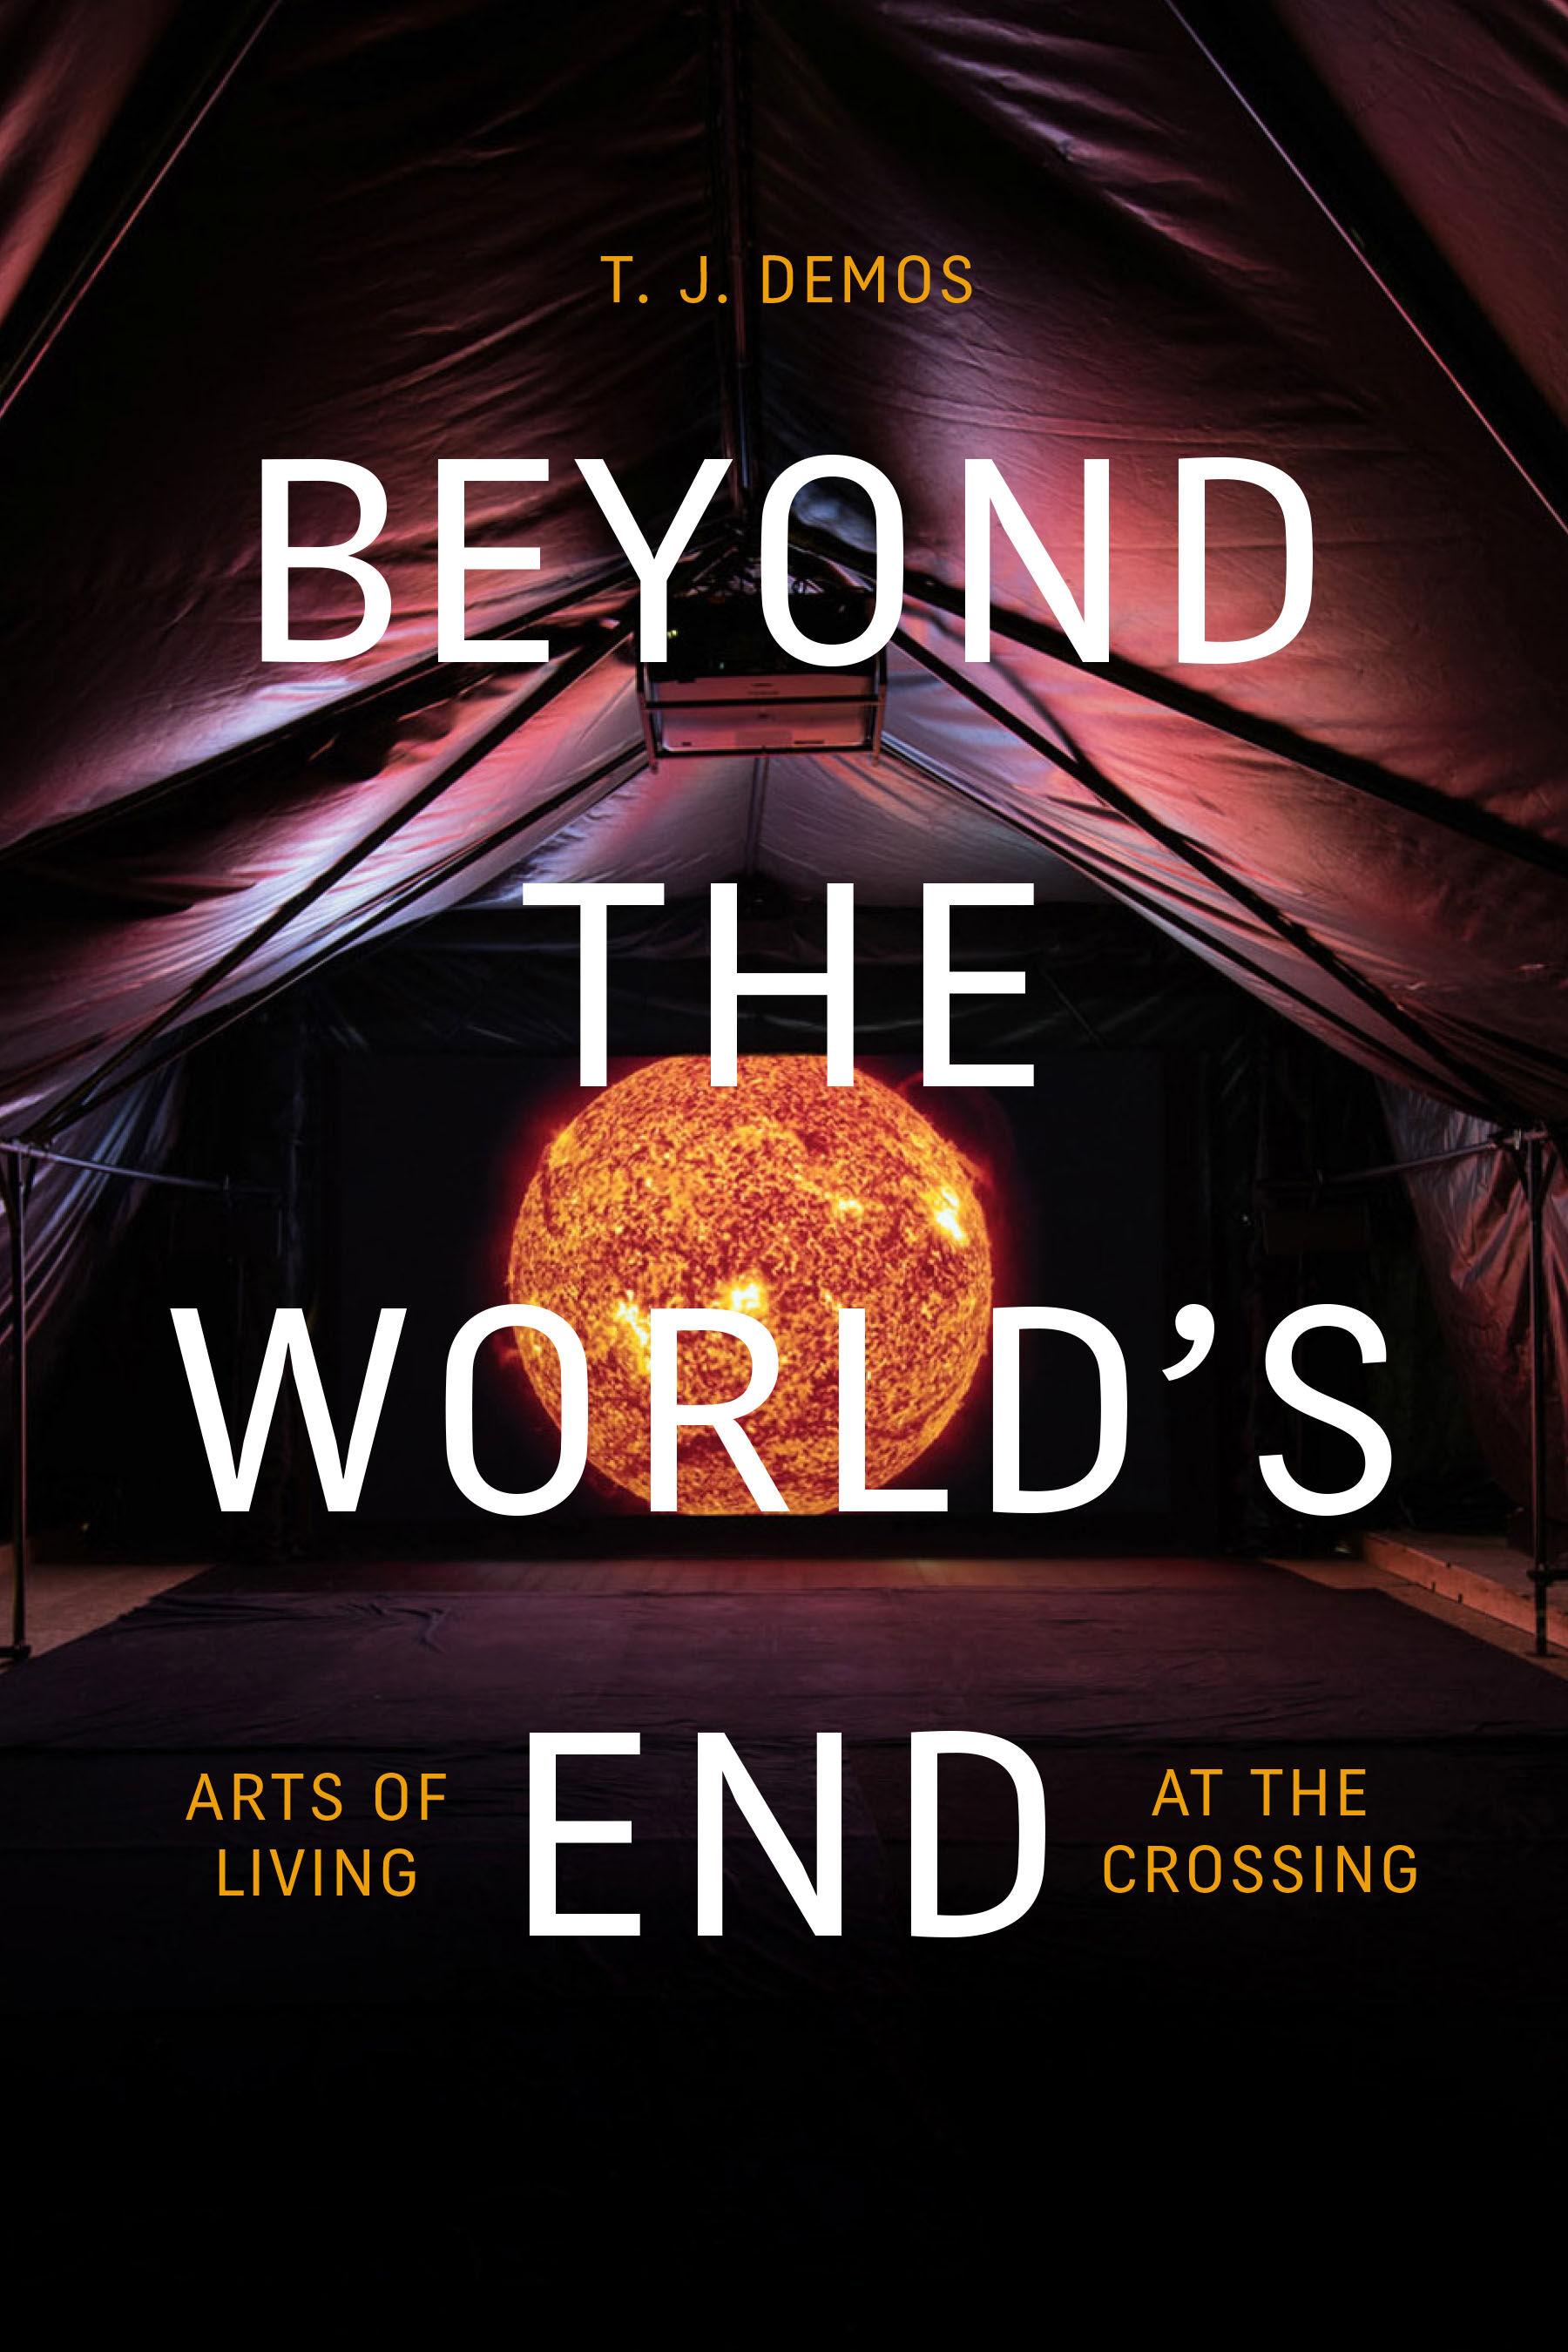 Рецензия на книгу: Demos TJ (2020). Beyond the World's End: Arts of Living at the Crossing